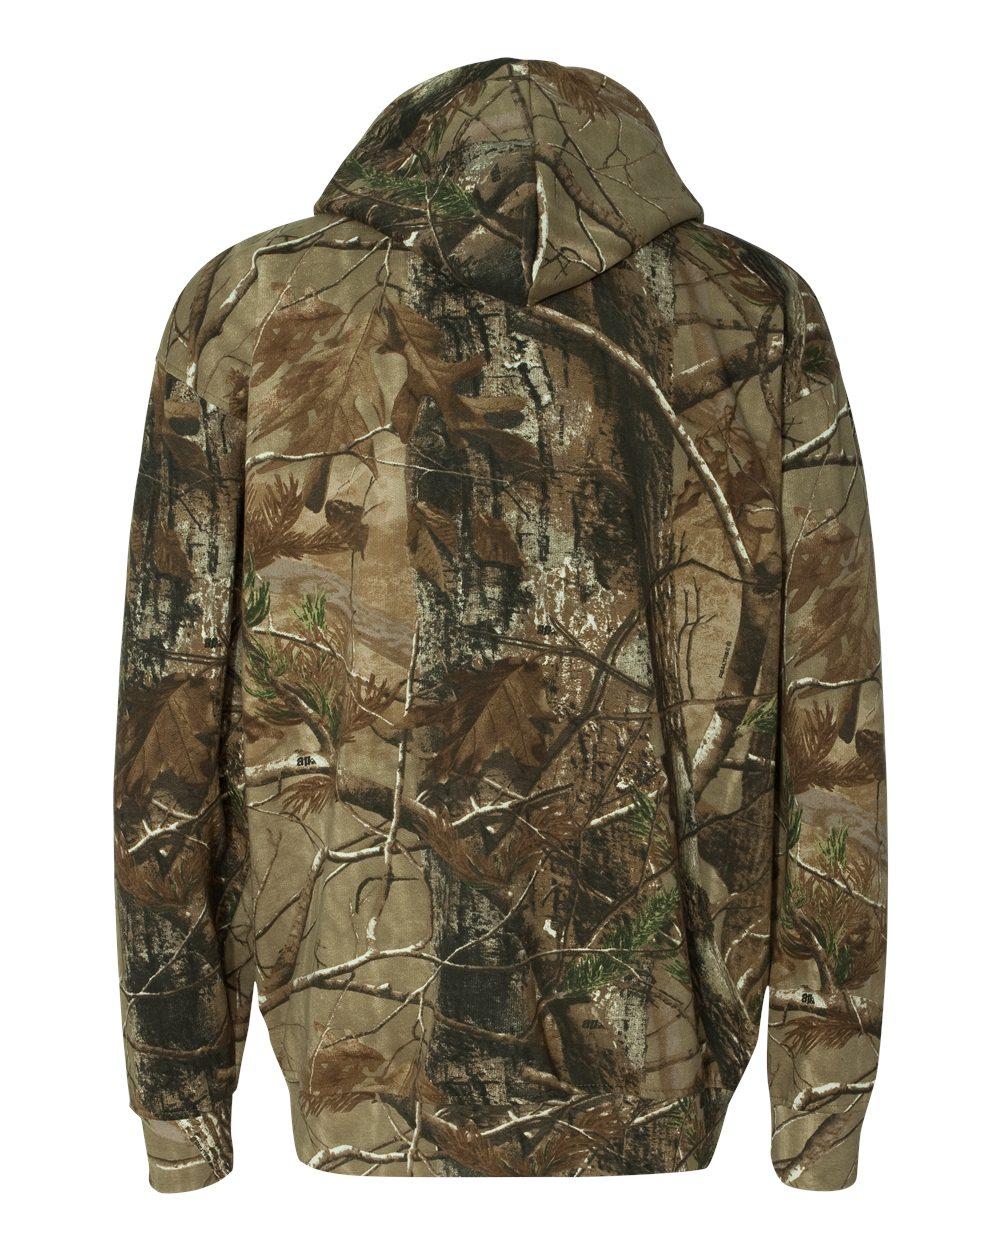 Code V Realtree® Hooded Full-Zip Sweatshirt - 3989